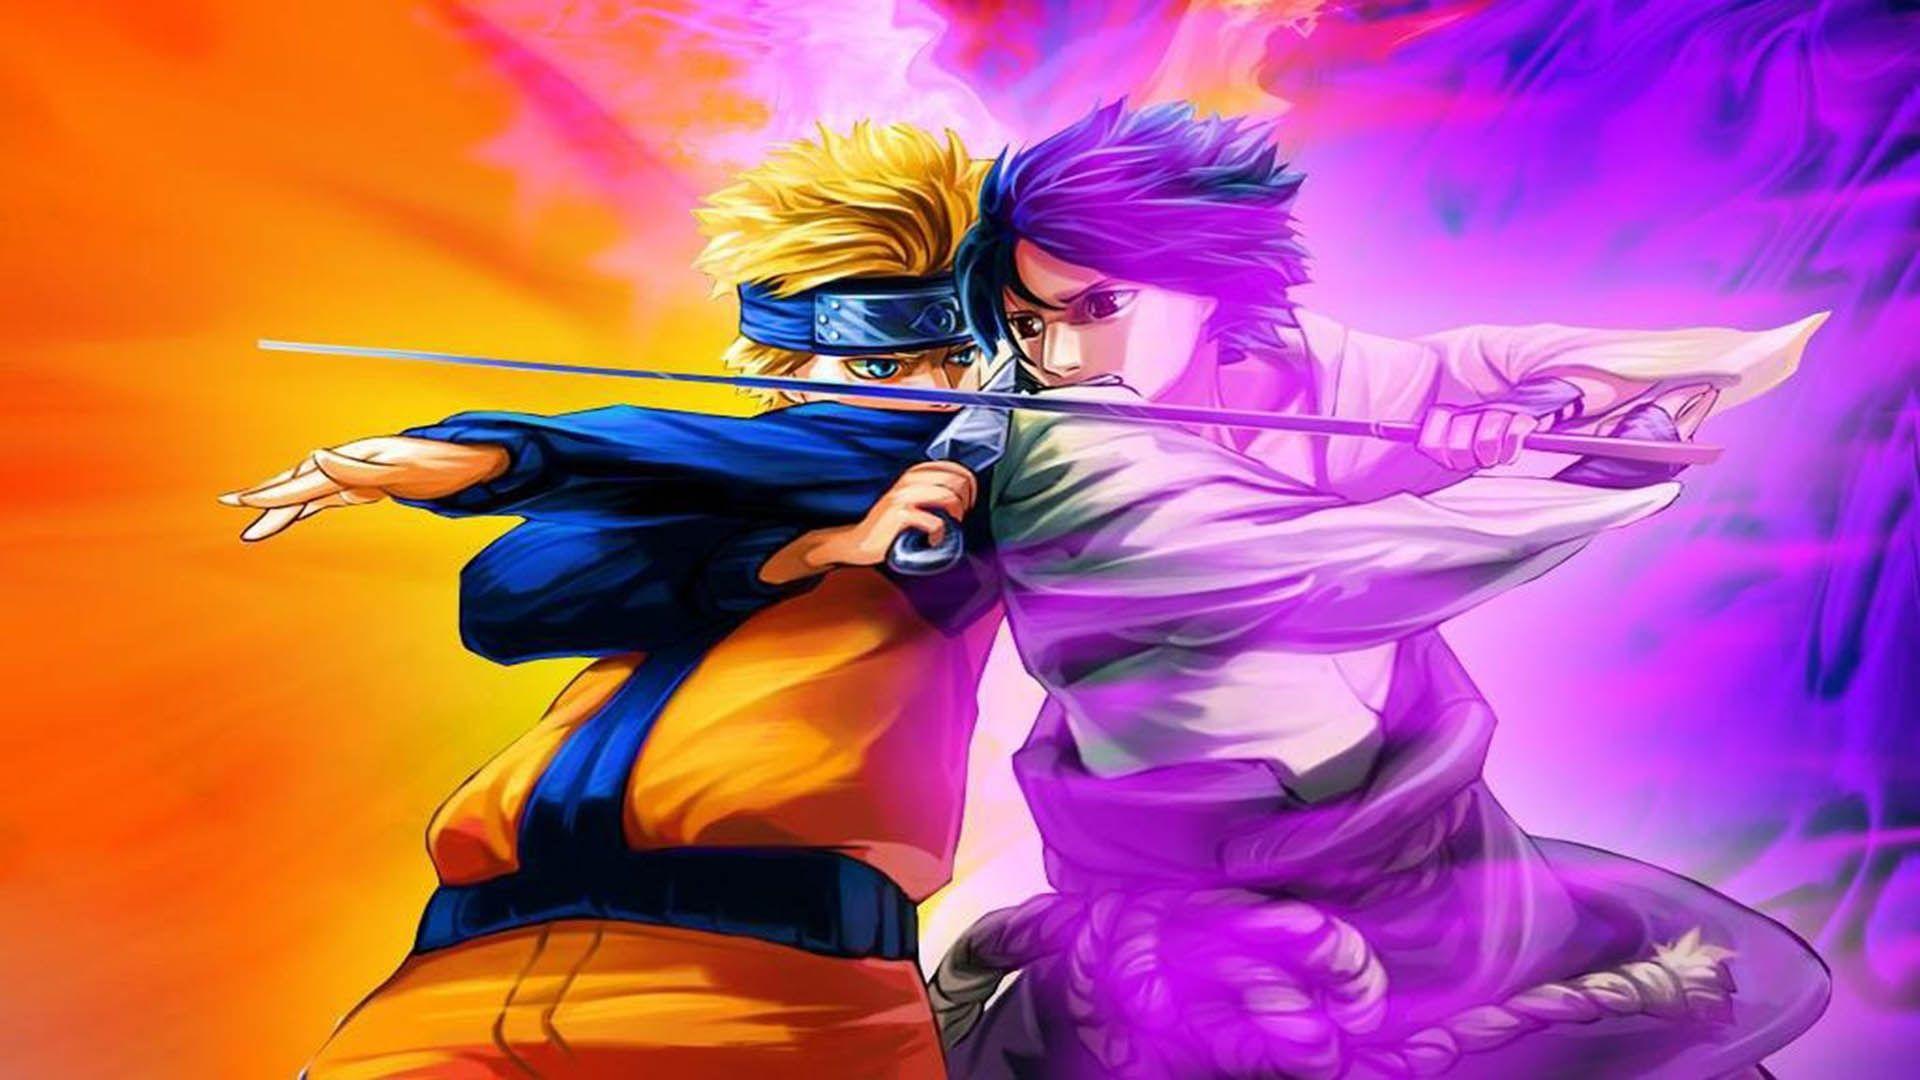 Naruto and Sasuke, Computer Wallpaper